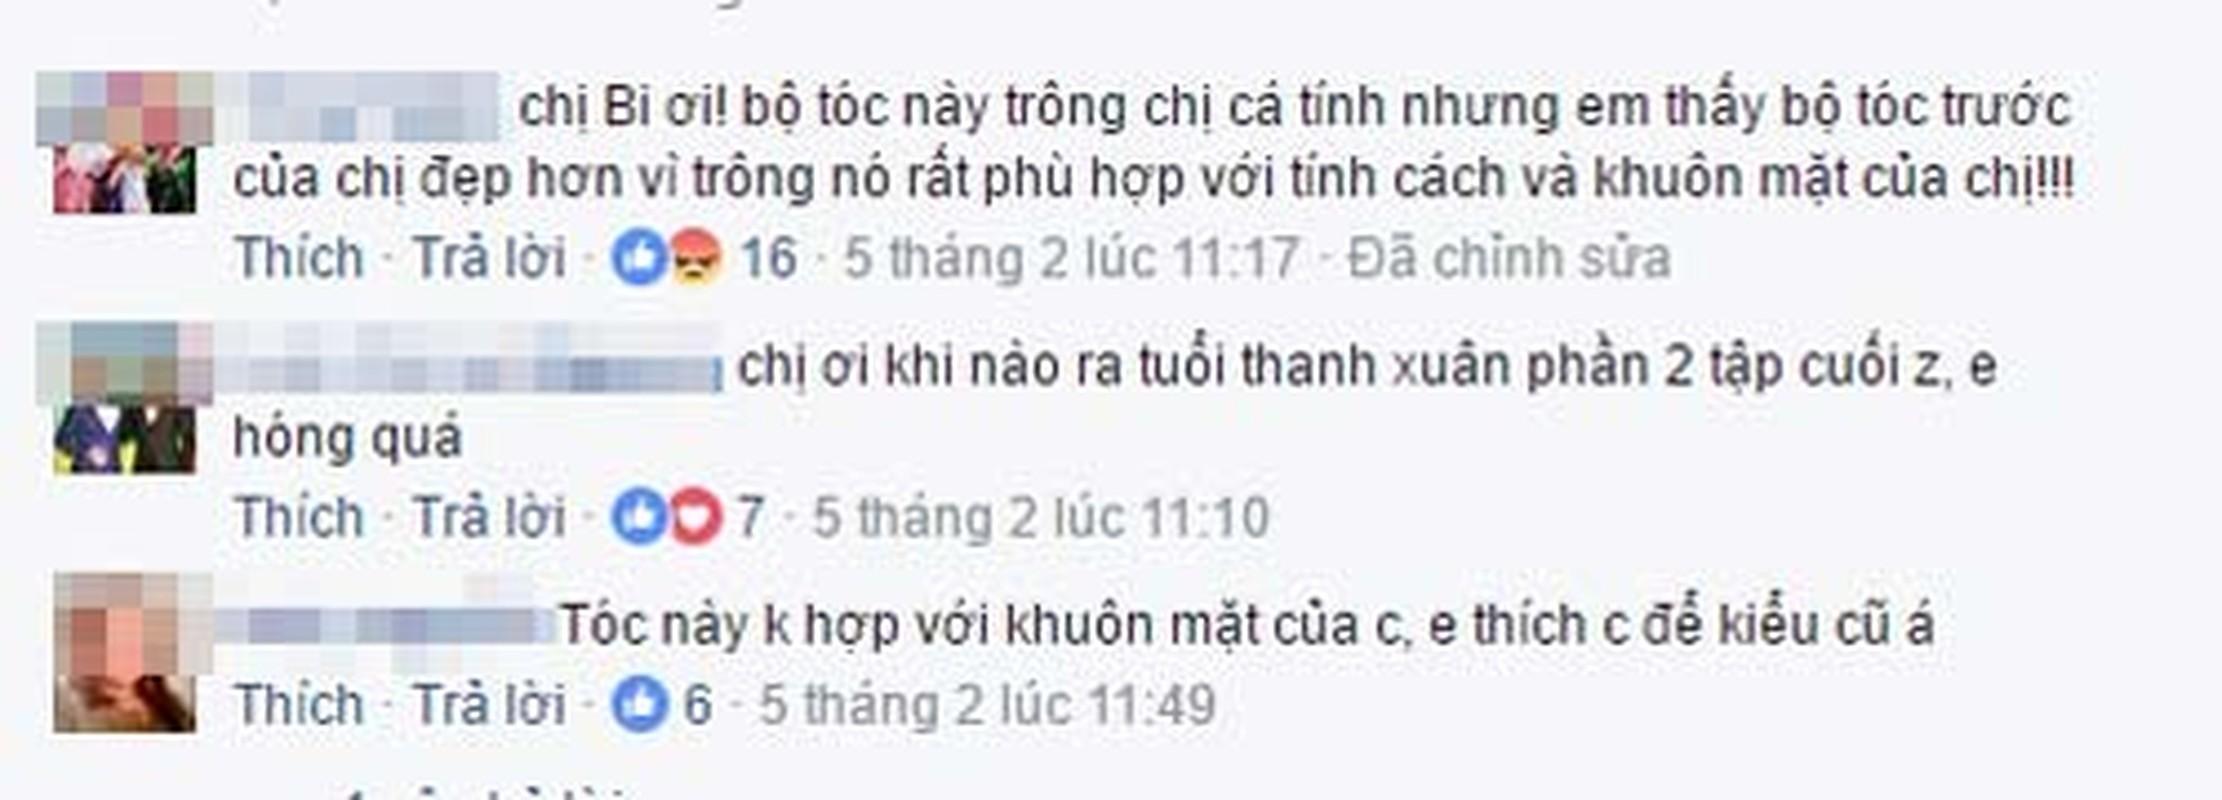 Vi sao kieu toc moi cua Nha Phuong bi fans phan doi?-Hinh-4